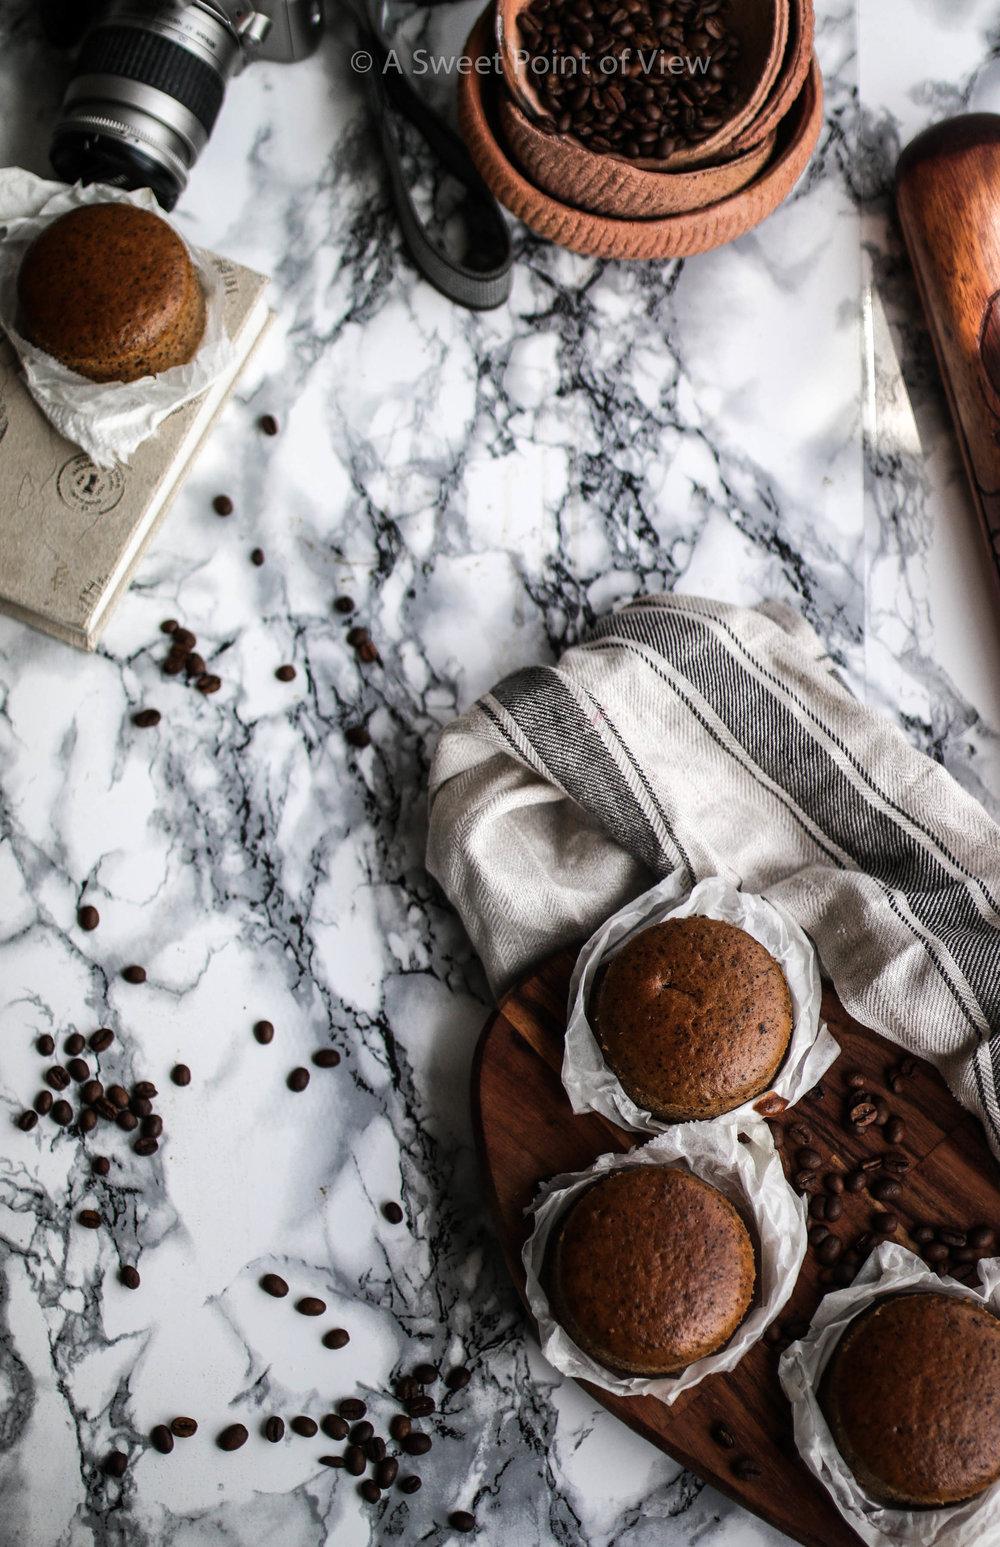 Ethopian-Coffee-Cake-10-of-1.jpg